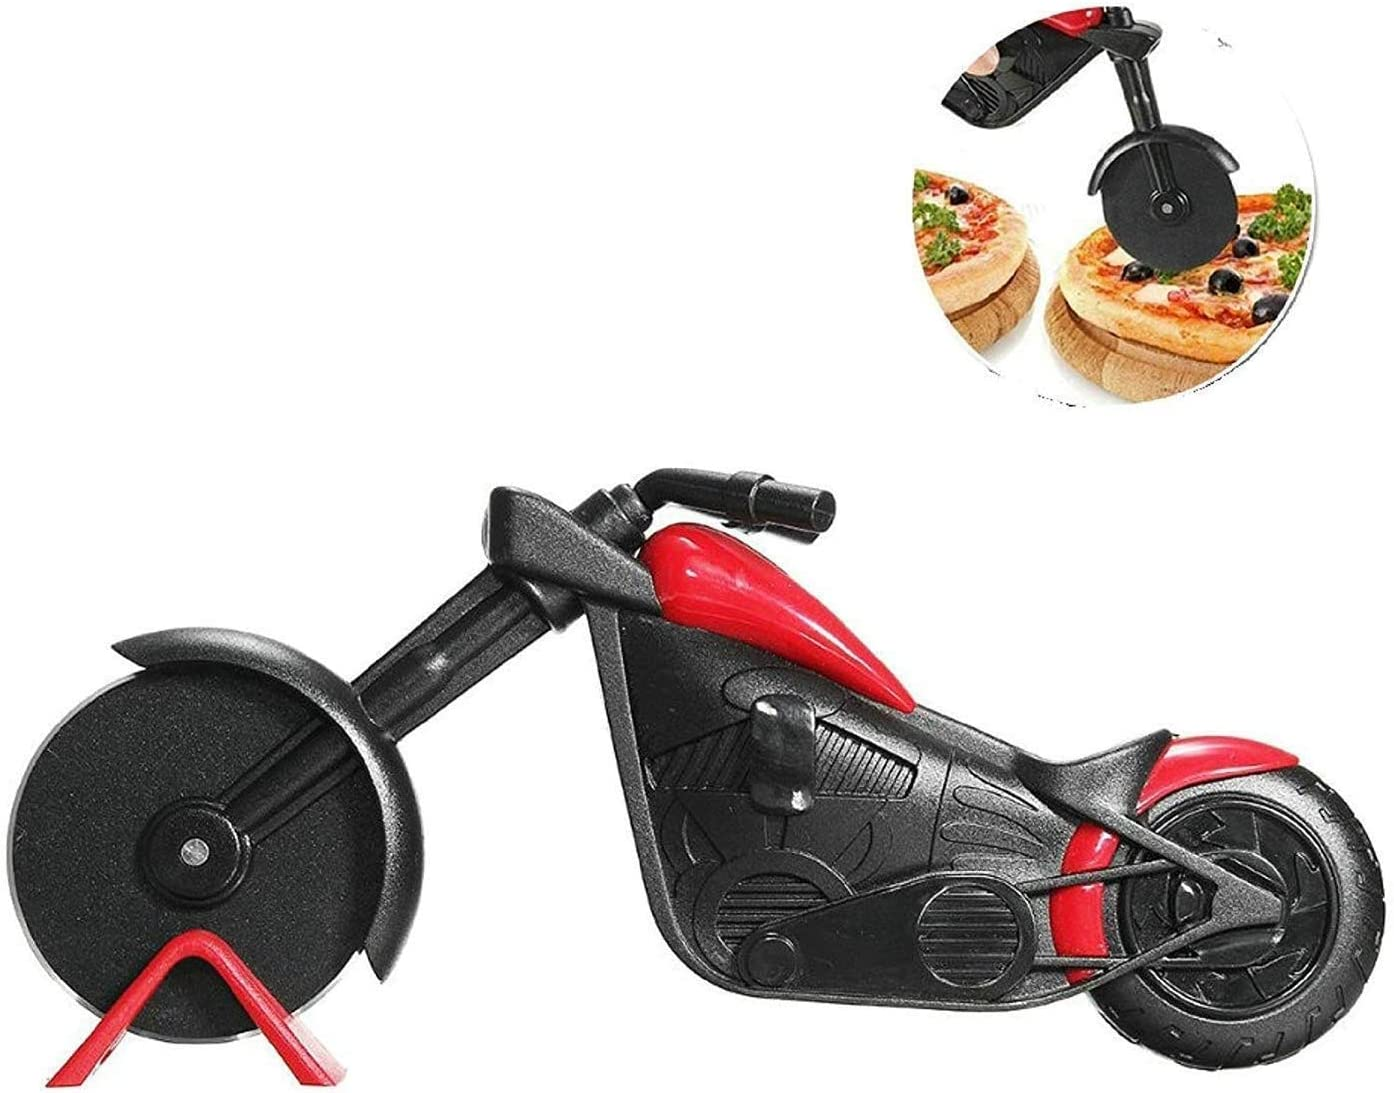 Rueda de Pizza Cortapizzas Black Corta Pizzas Cuchillo de Rodillo de Pizza de Rueda Delantera de Motocicleta Pizza Cutter Cortador de Pizza para Motocicleta